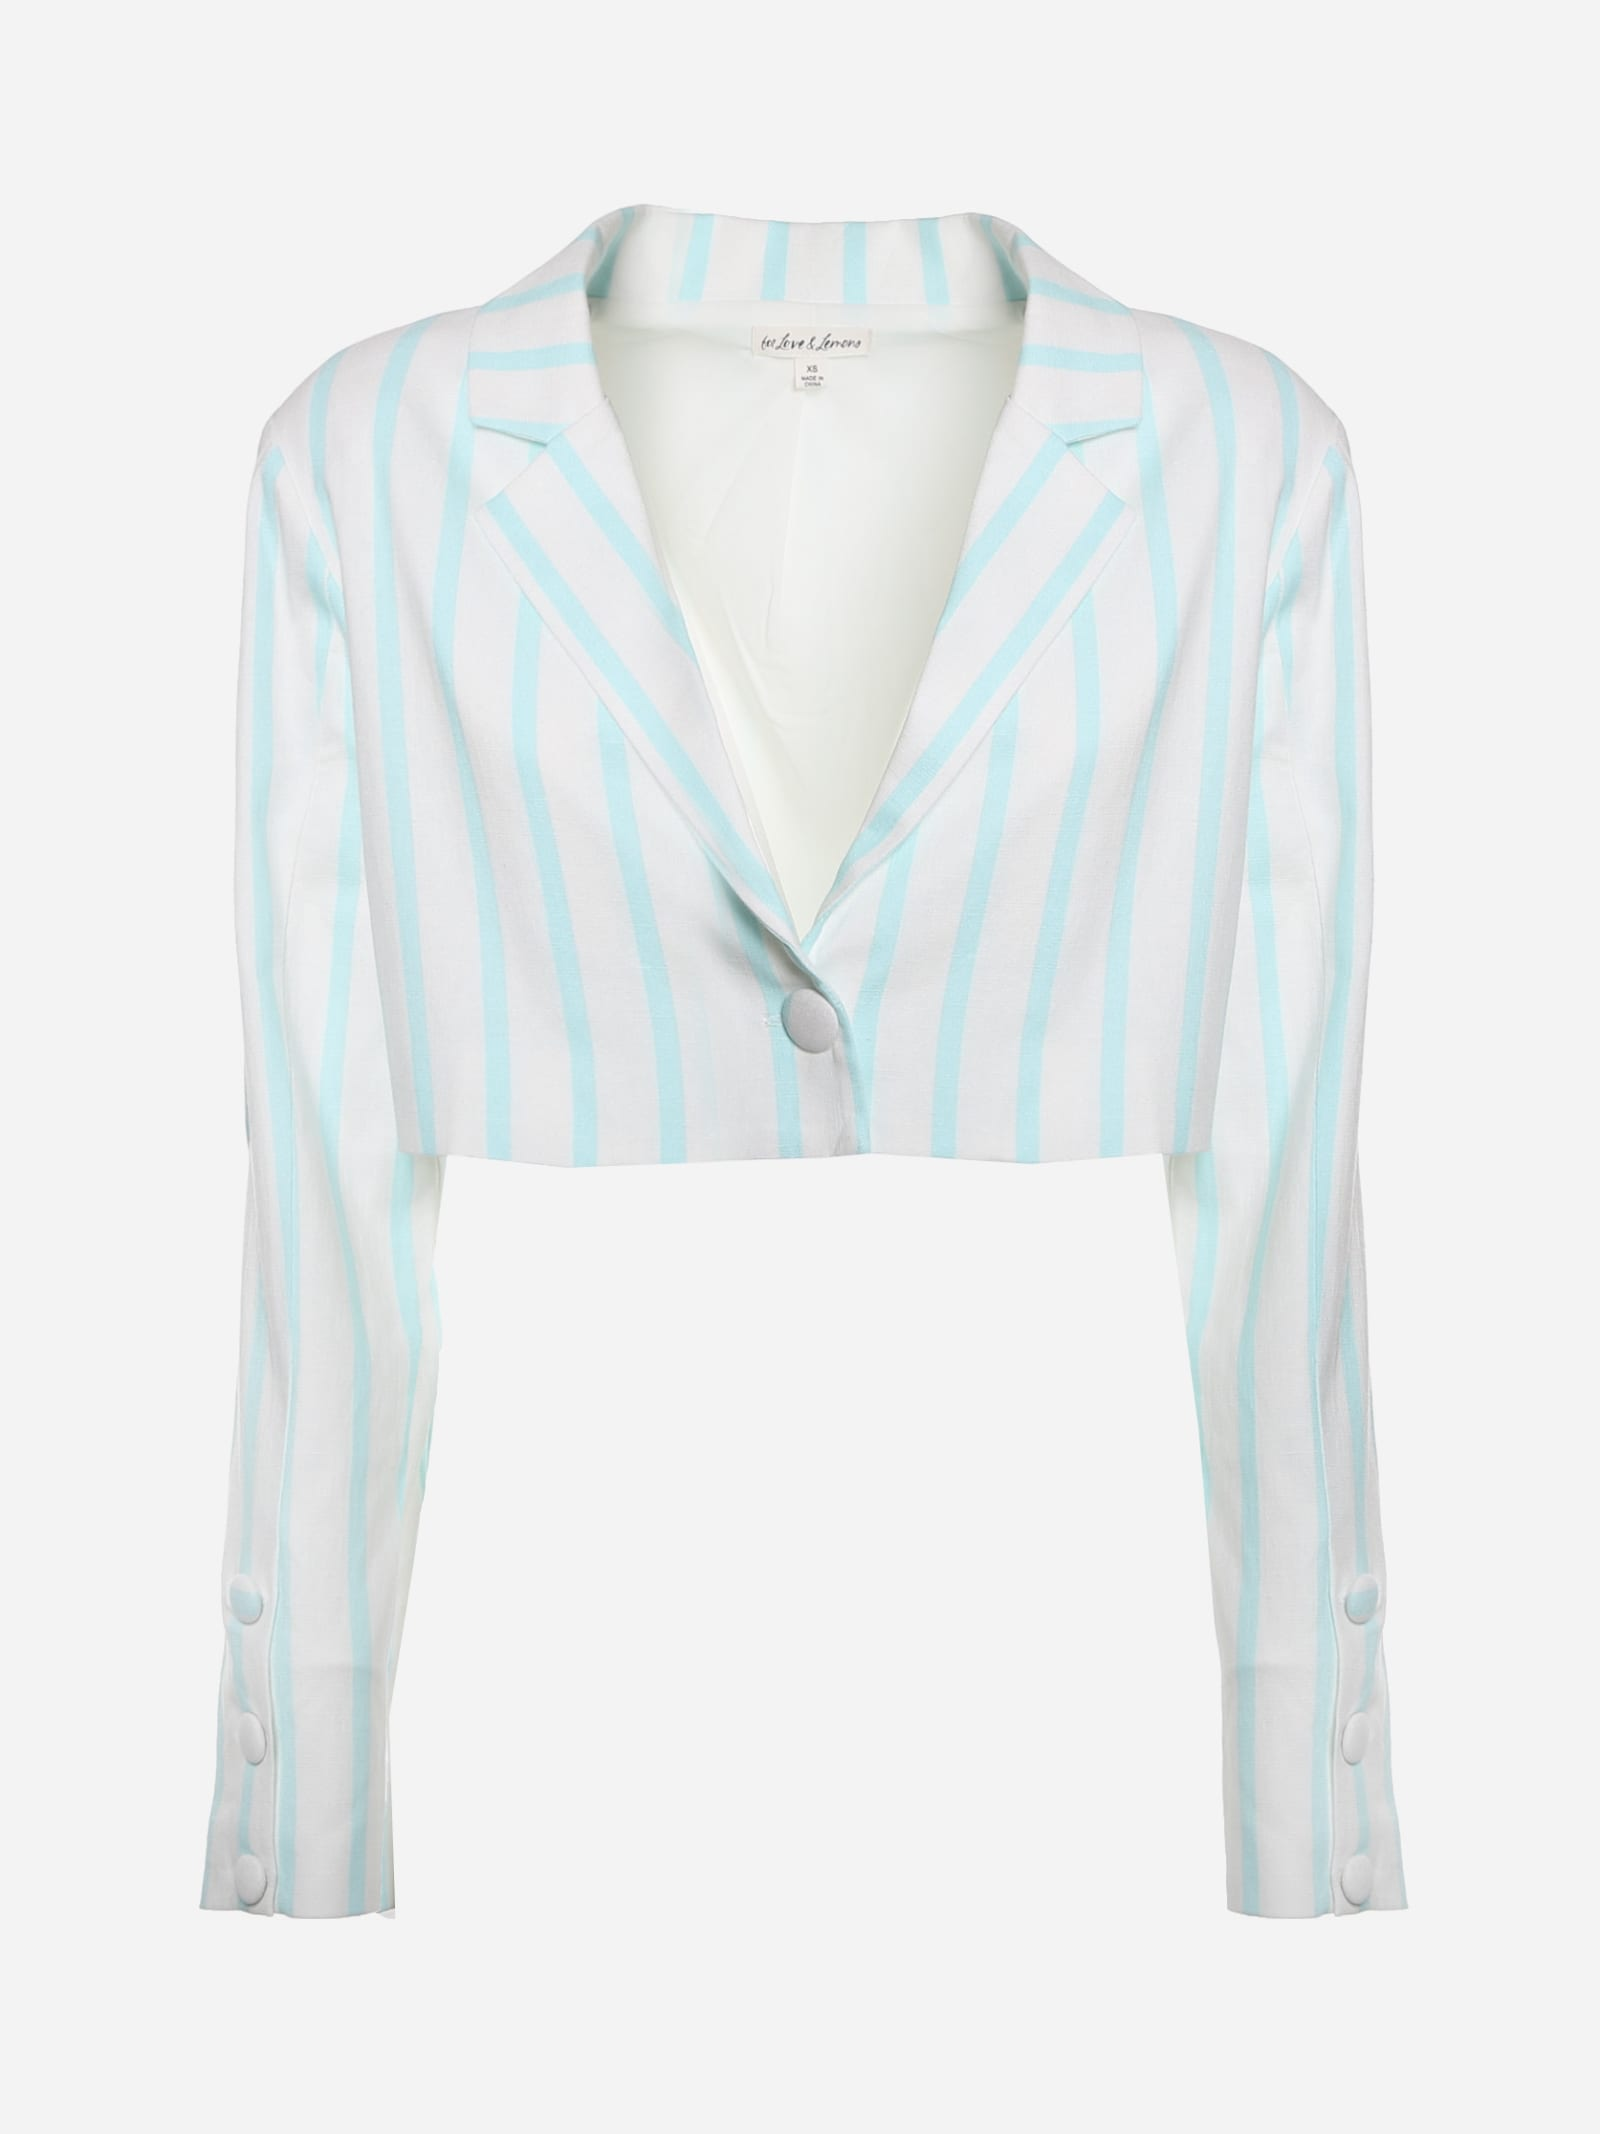 Short Blazer In Stretch Linen With Striped Print